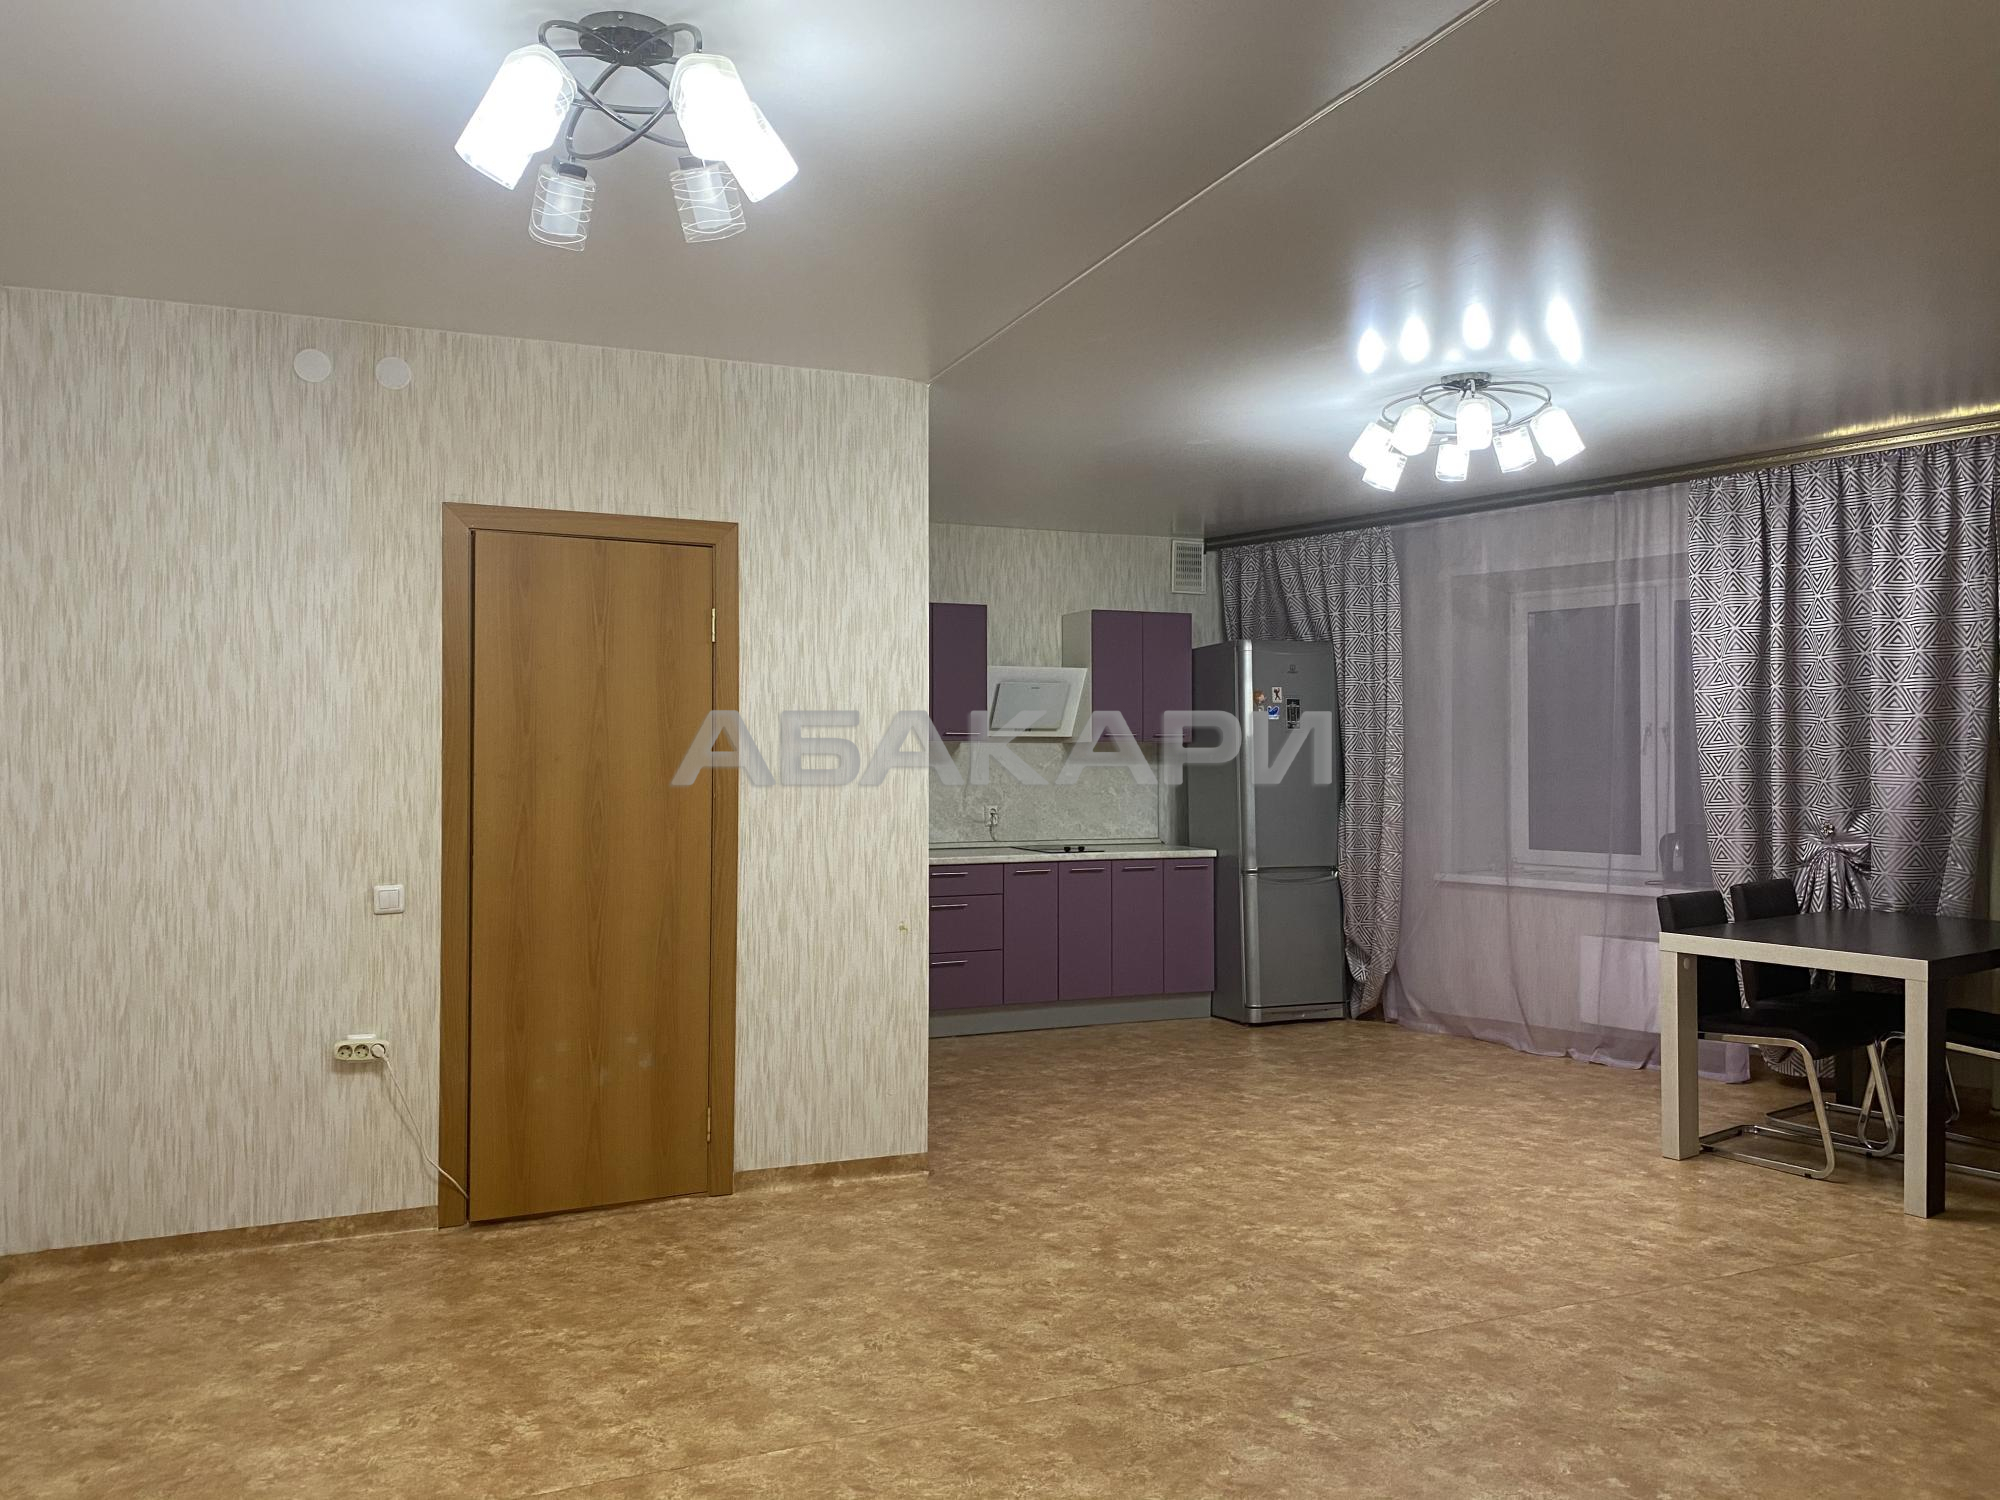 3к квартира Ботанический бульвар 9/16 - 126кв | 30000 | аренда в Красноярске фото 7